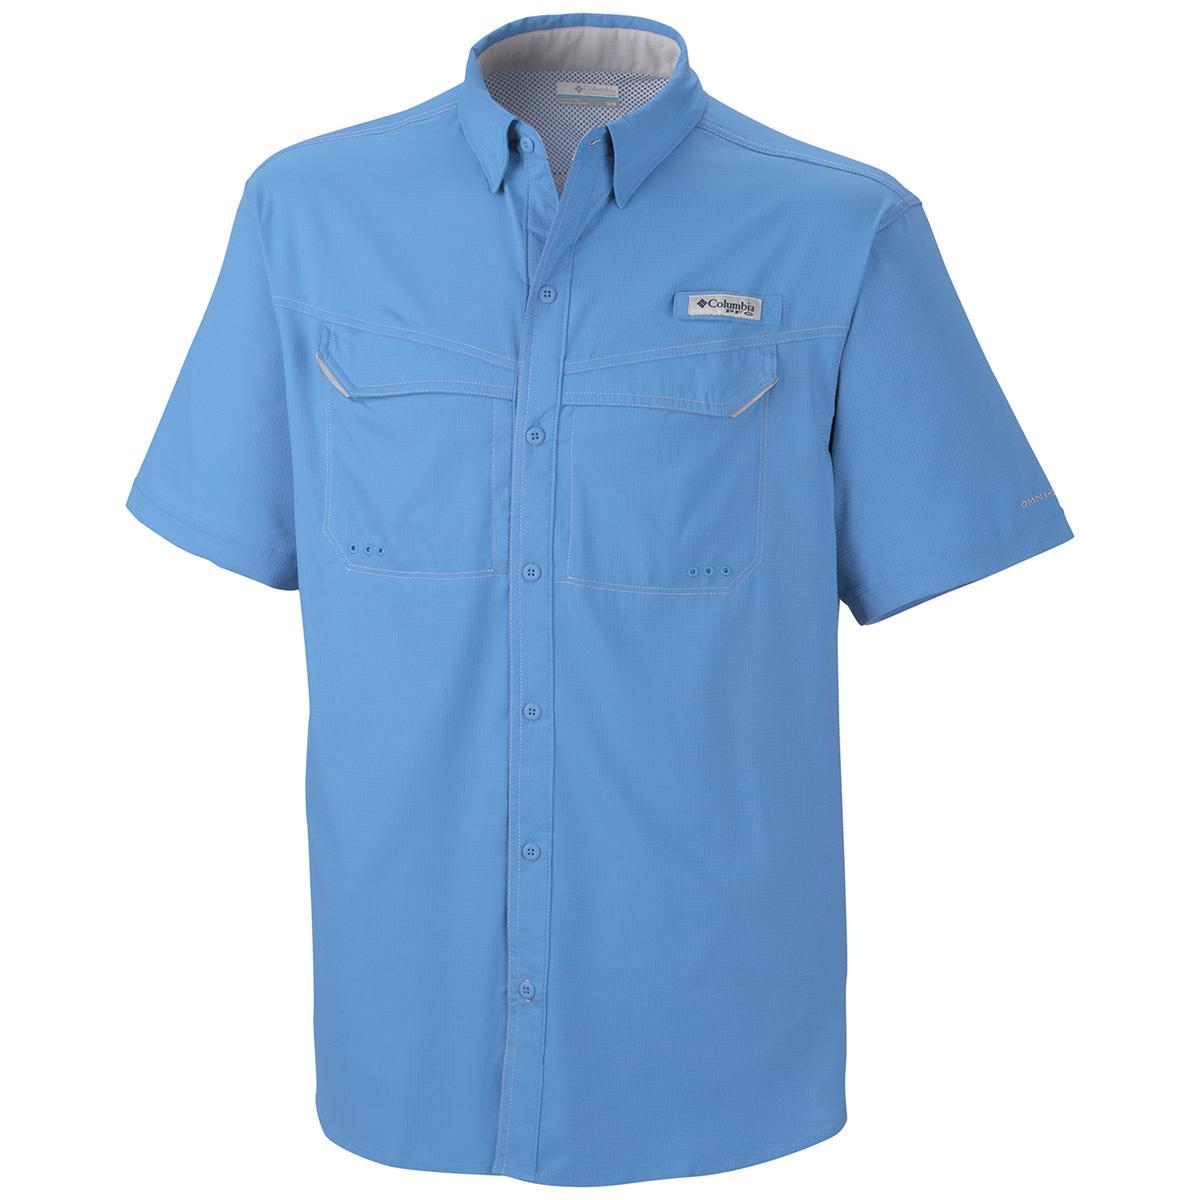 Columbia low drag offshore ss shirt fishing shirts ebay for Offshore fishing apparel